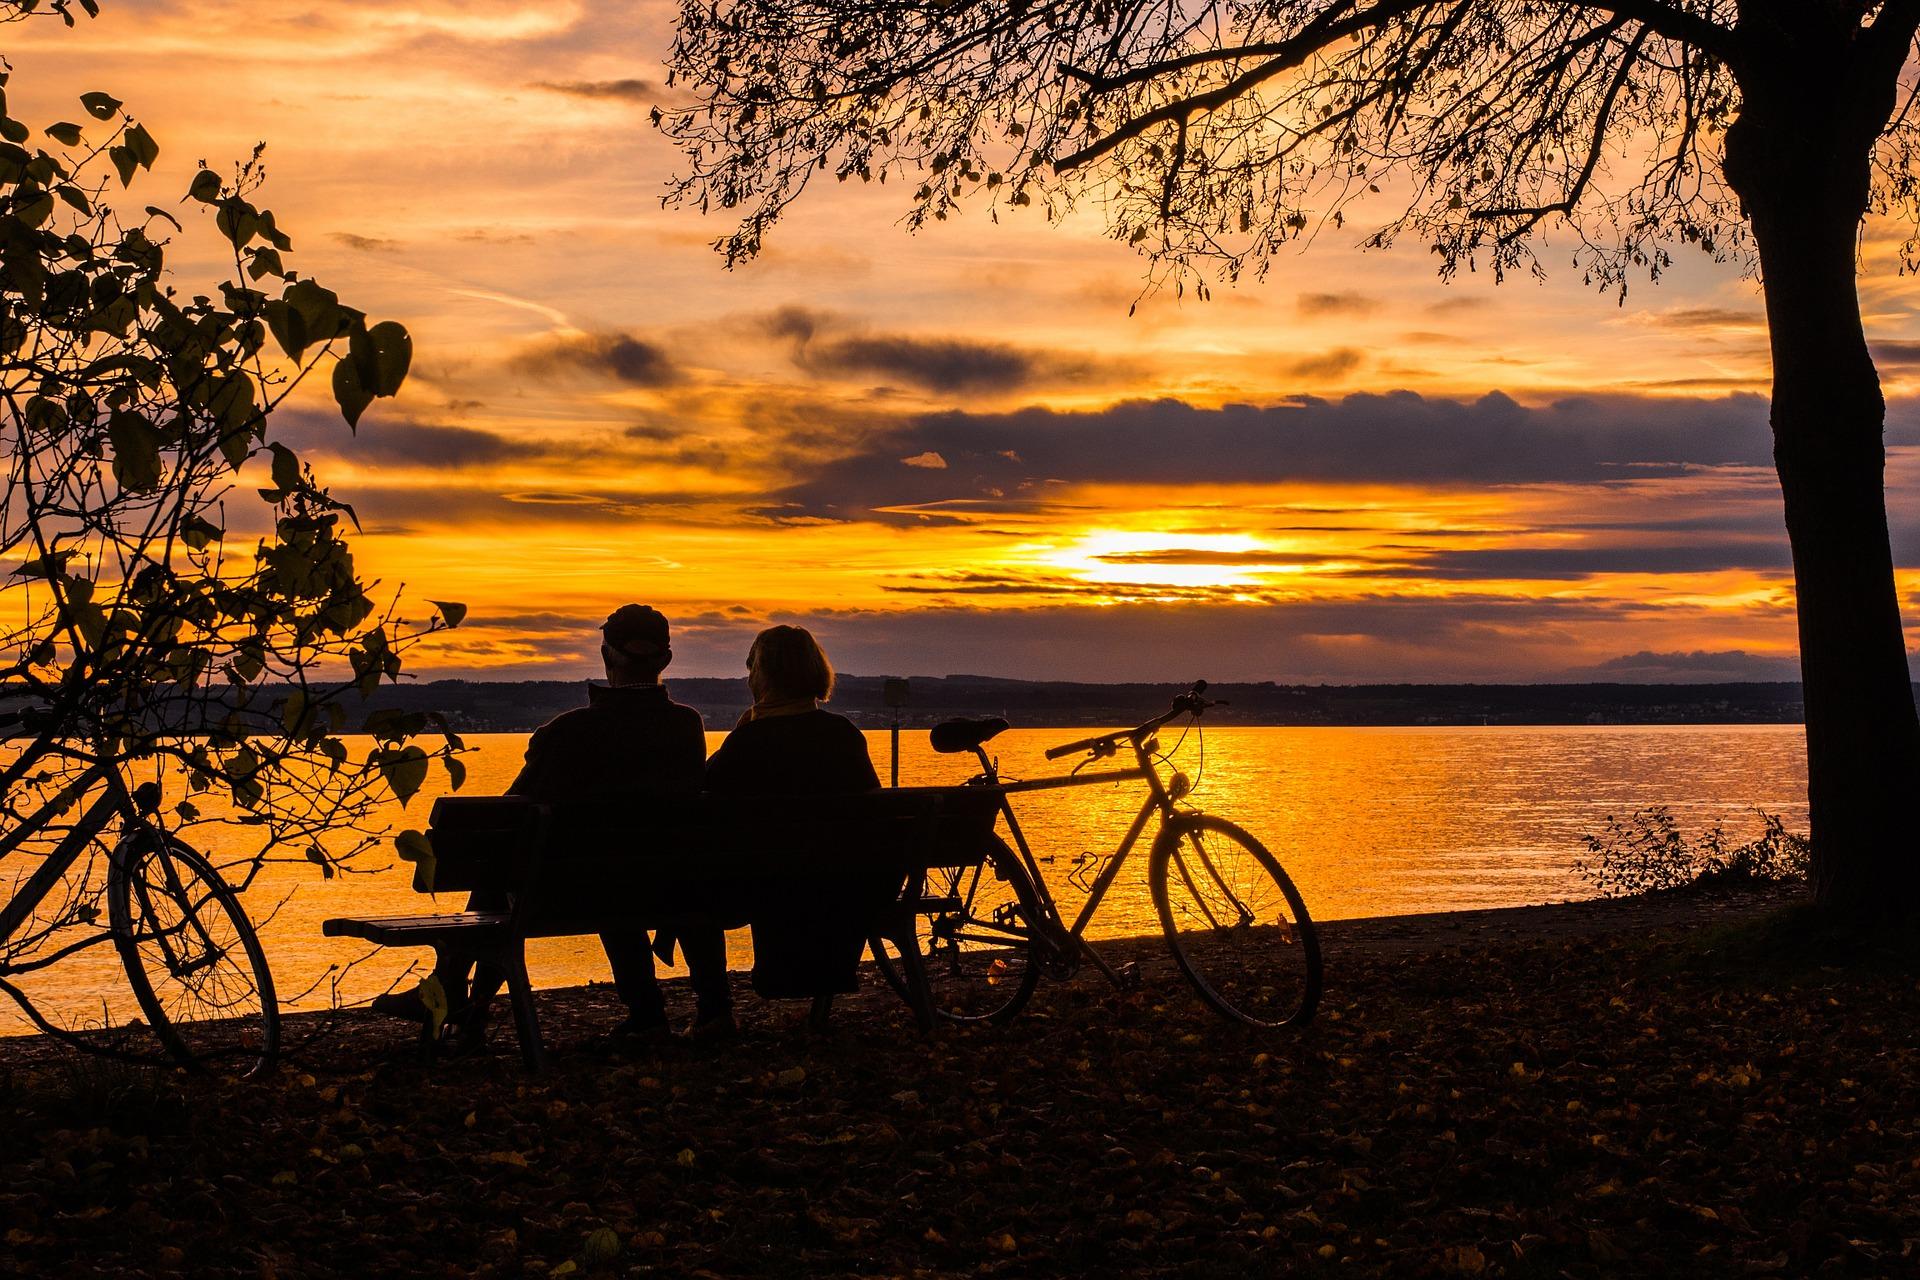 bikers in sunset.jpg